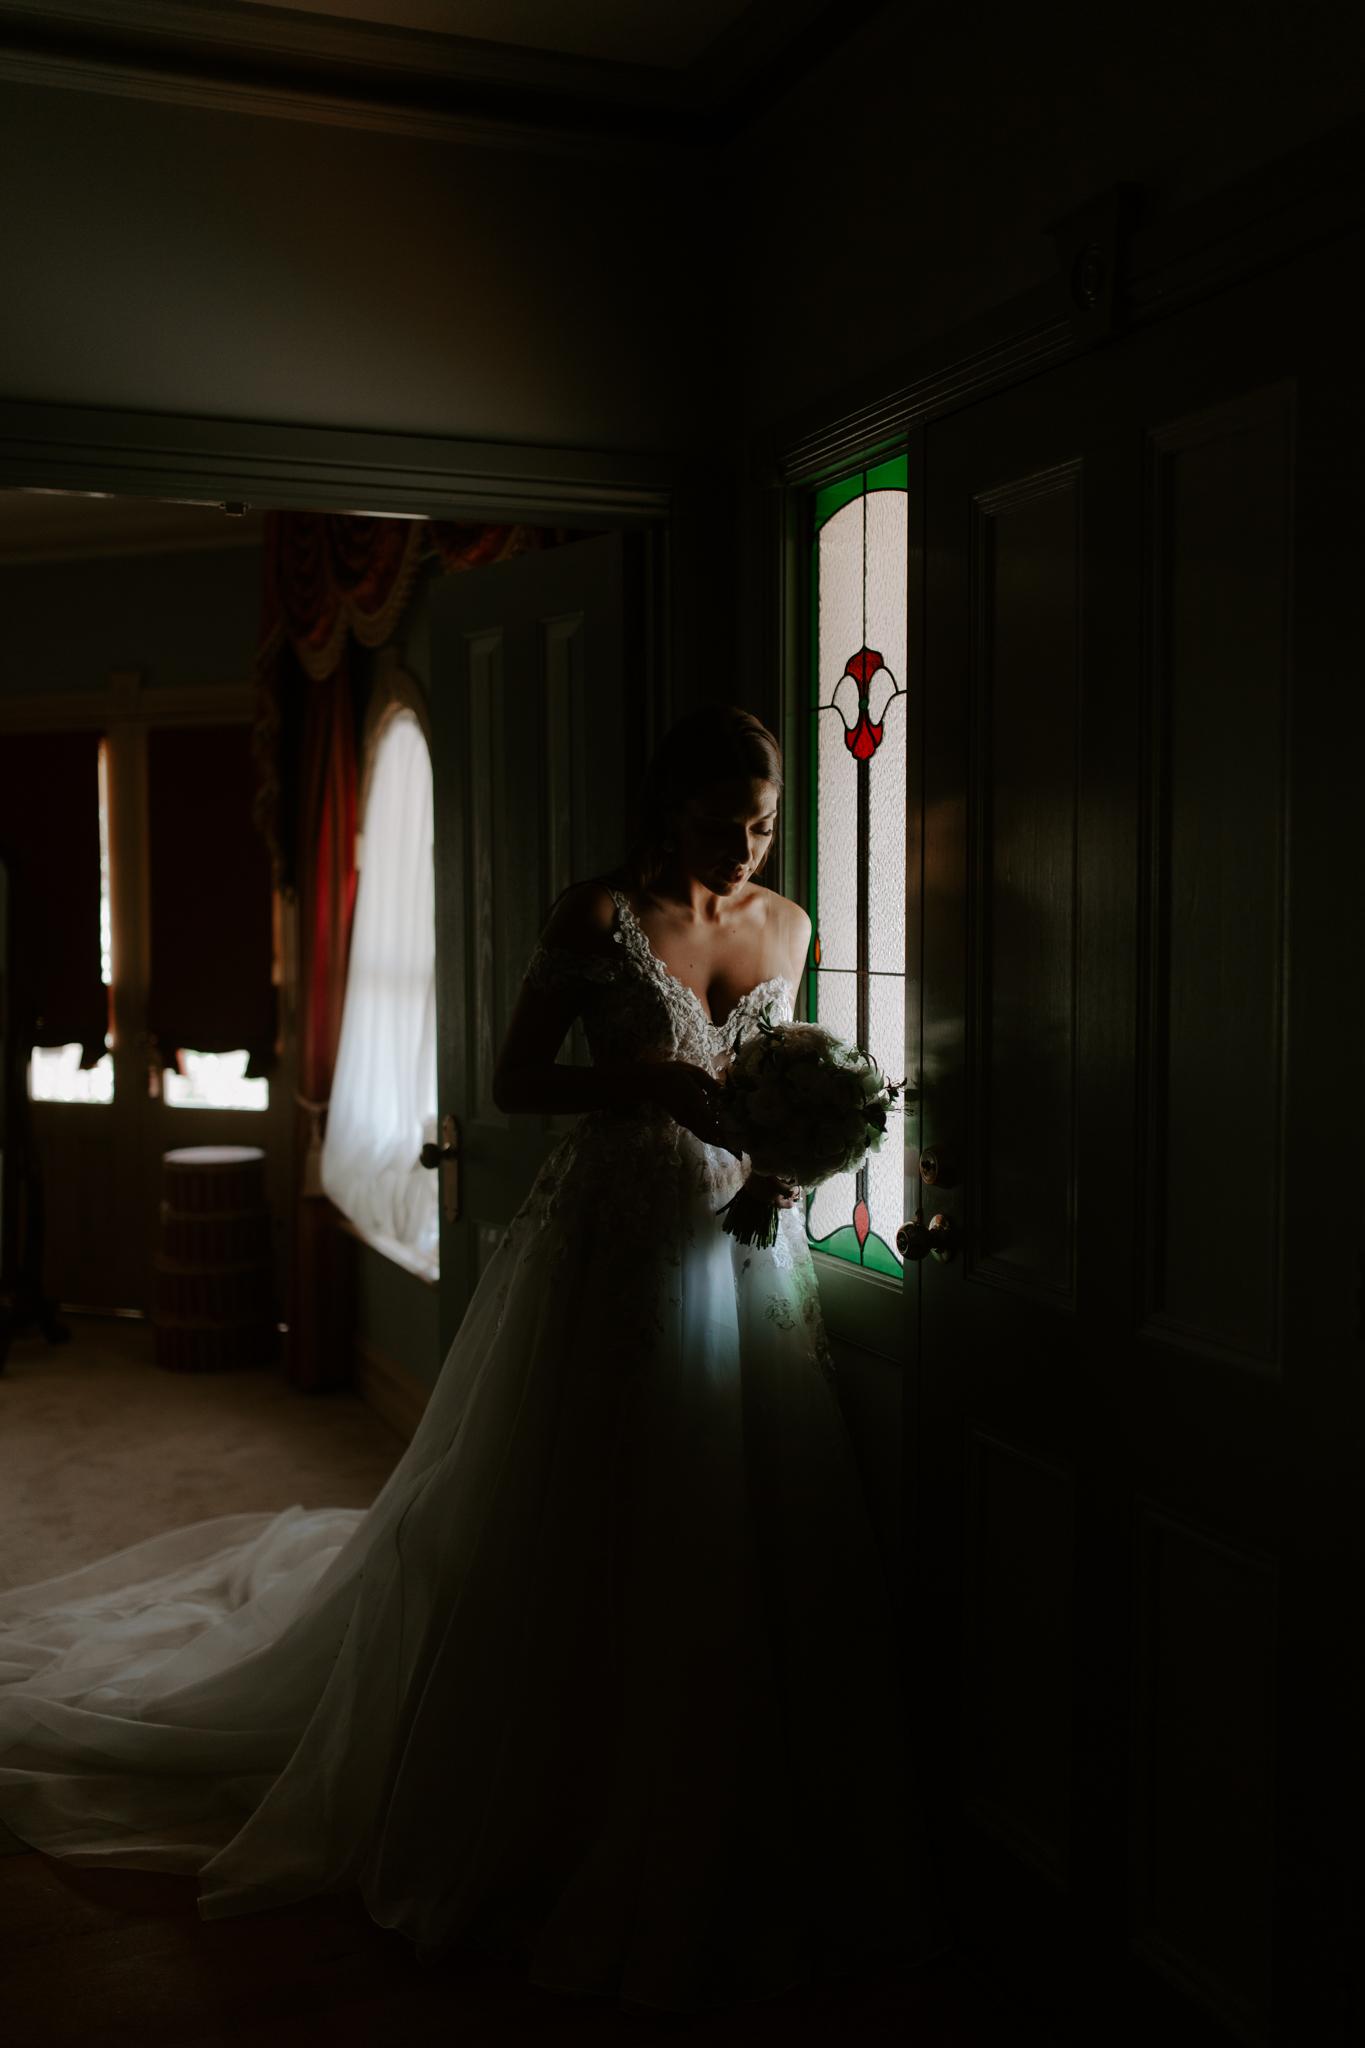 The-Stones-of-Yarra-Valley-Wedding-EmotionsandMathPhotography-017.jpg